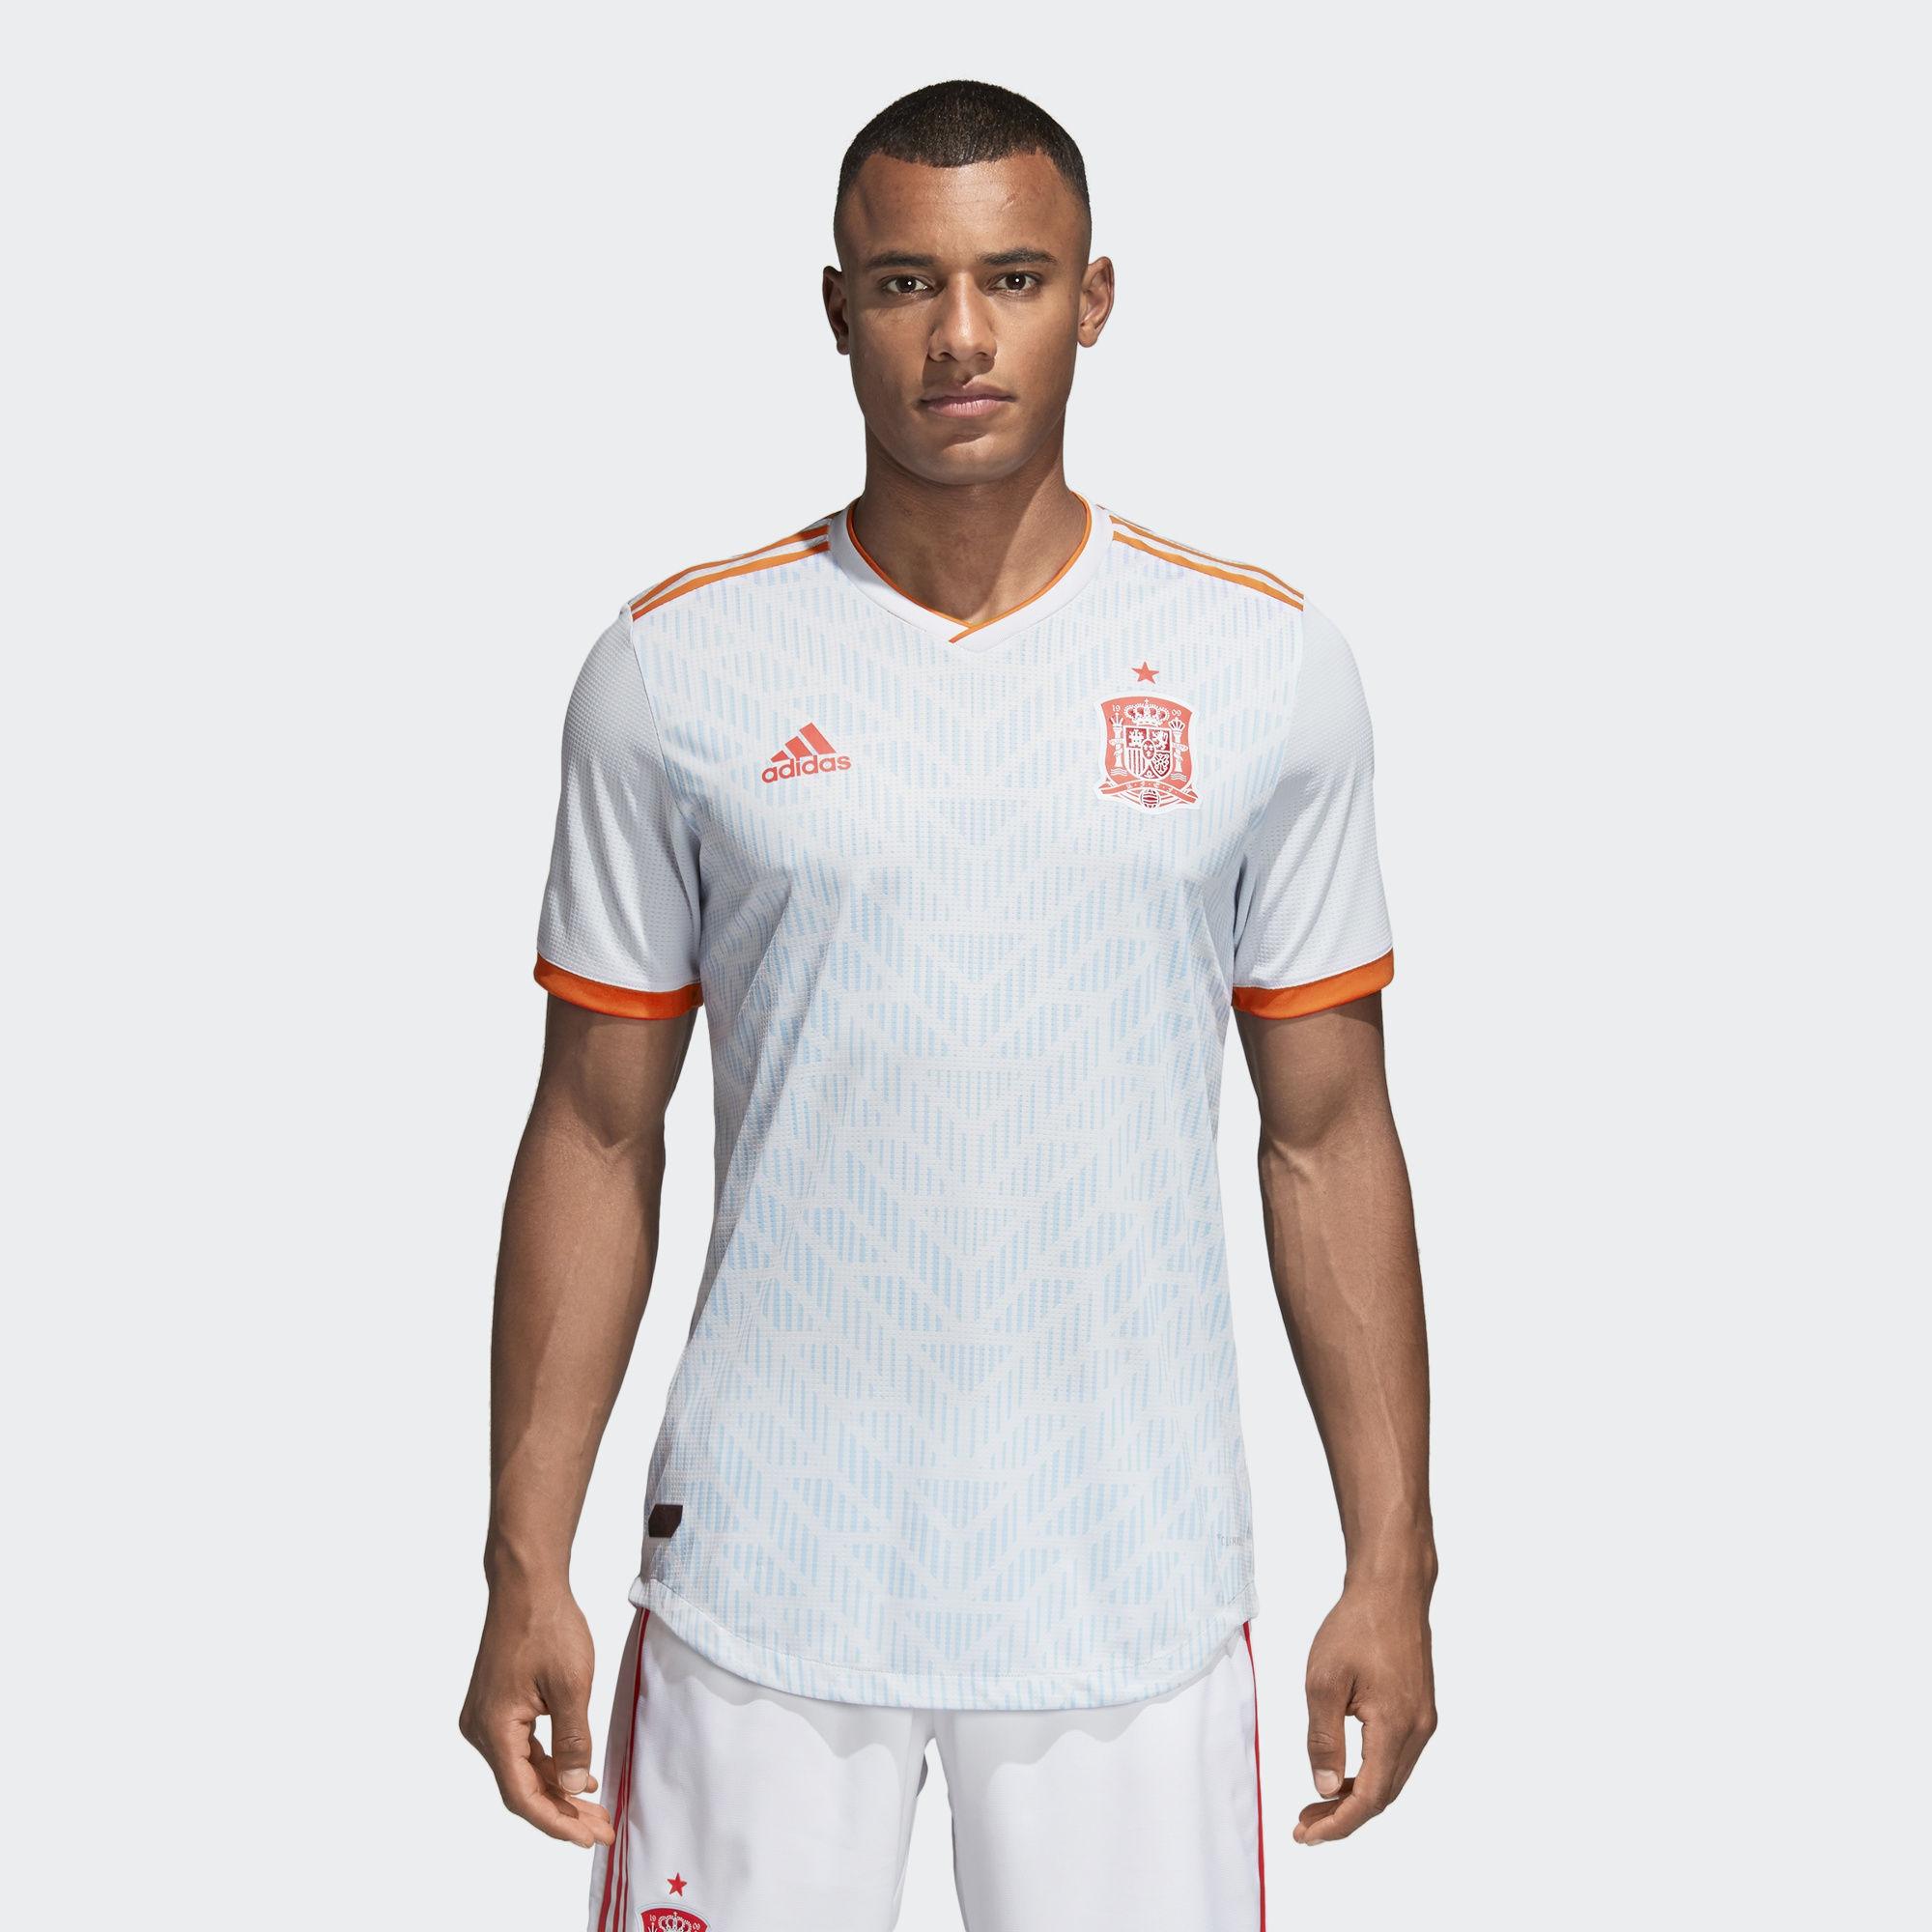 online store a0c8f d4915 Jersey - Spain Away Kit World Cup Official 2018 Jersey Football Jersey  Online